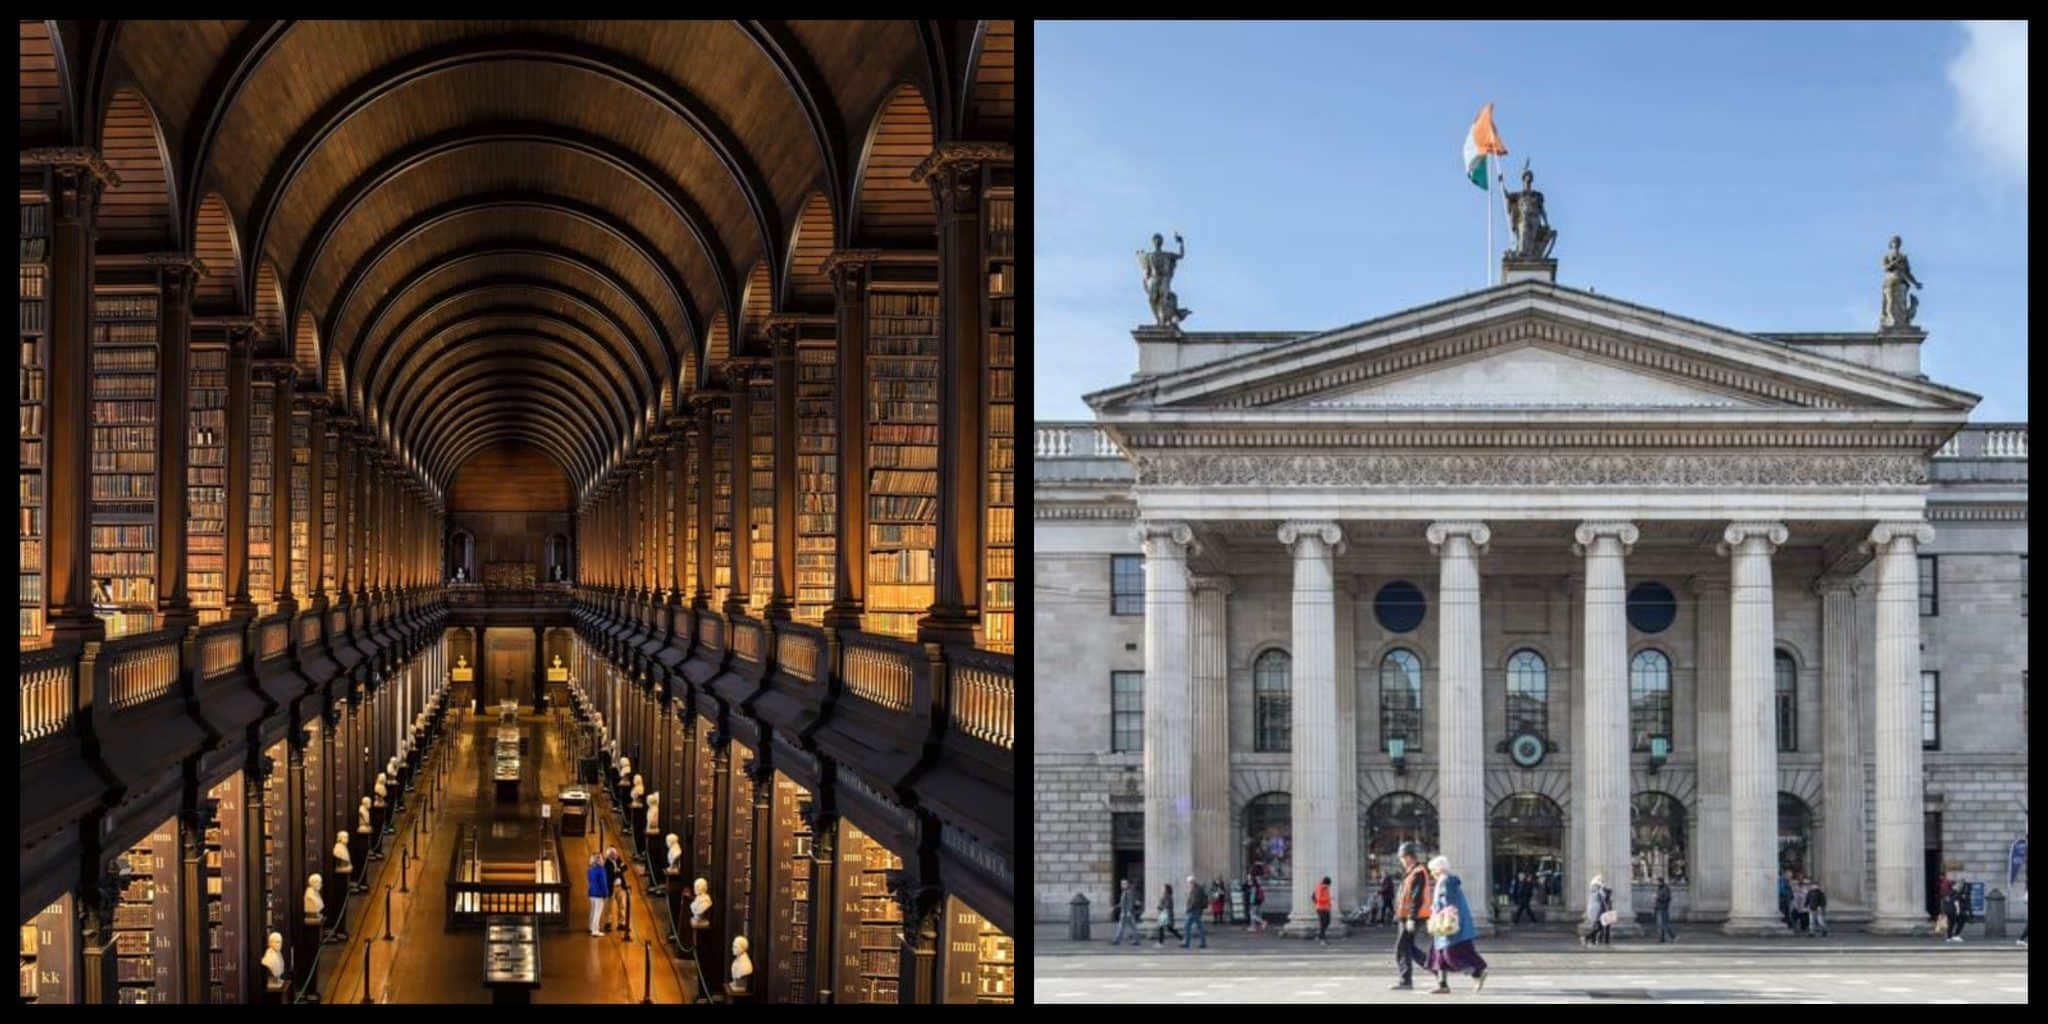 Dublin Bucket List The 25 Best Things To Do In Dublin Ireland 2020